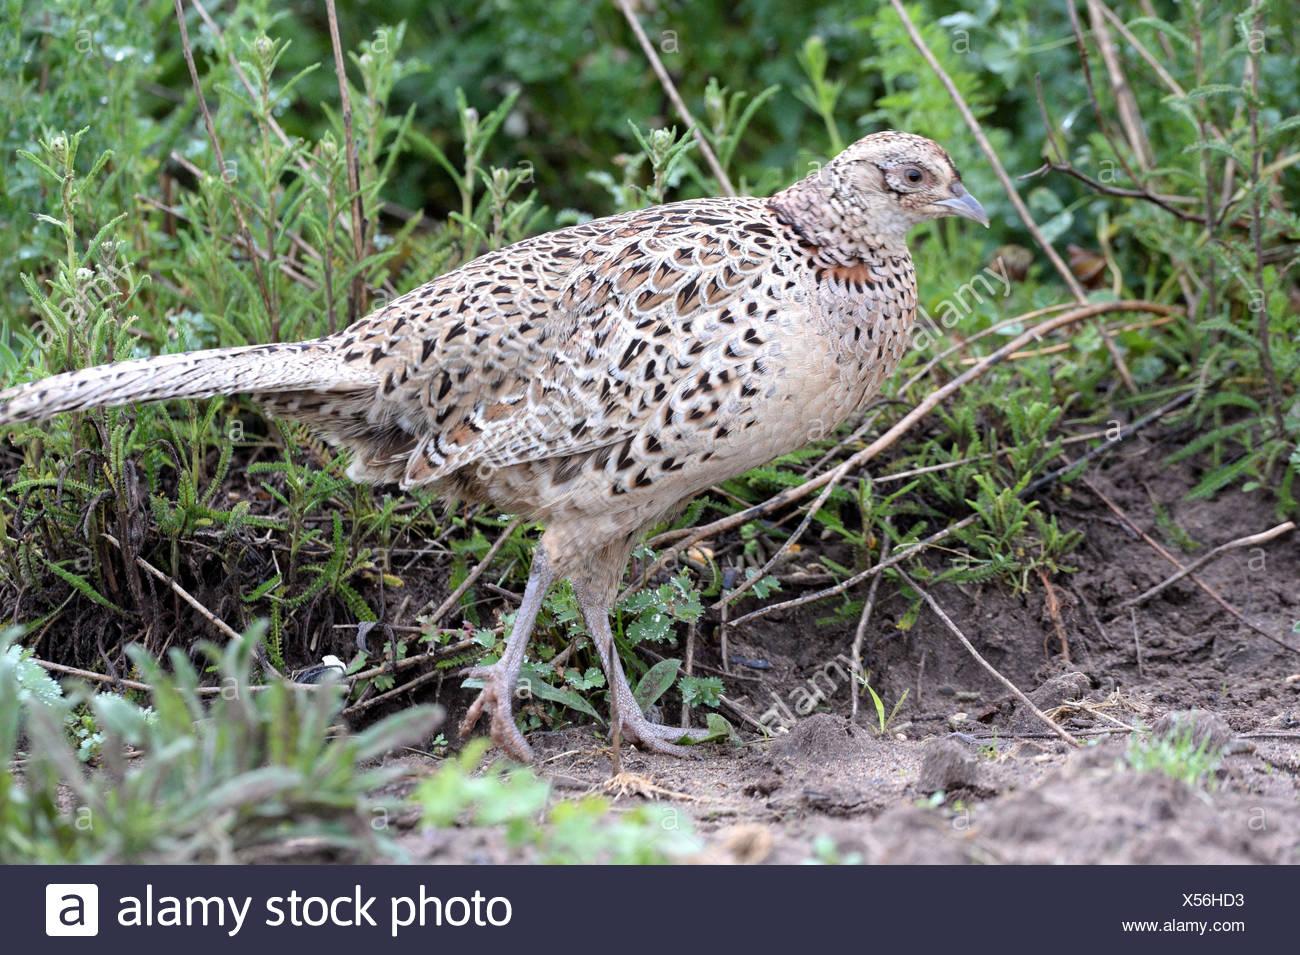 Pheasant, pheasant hen, Phasianus colchicus, - Stock Image